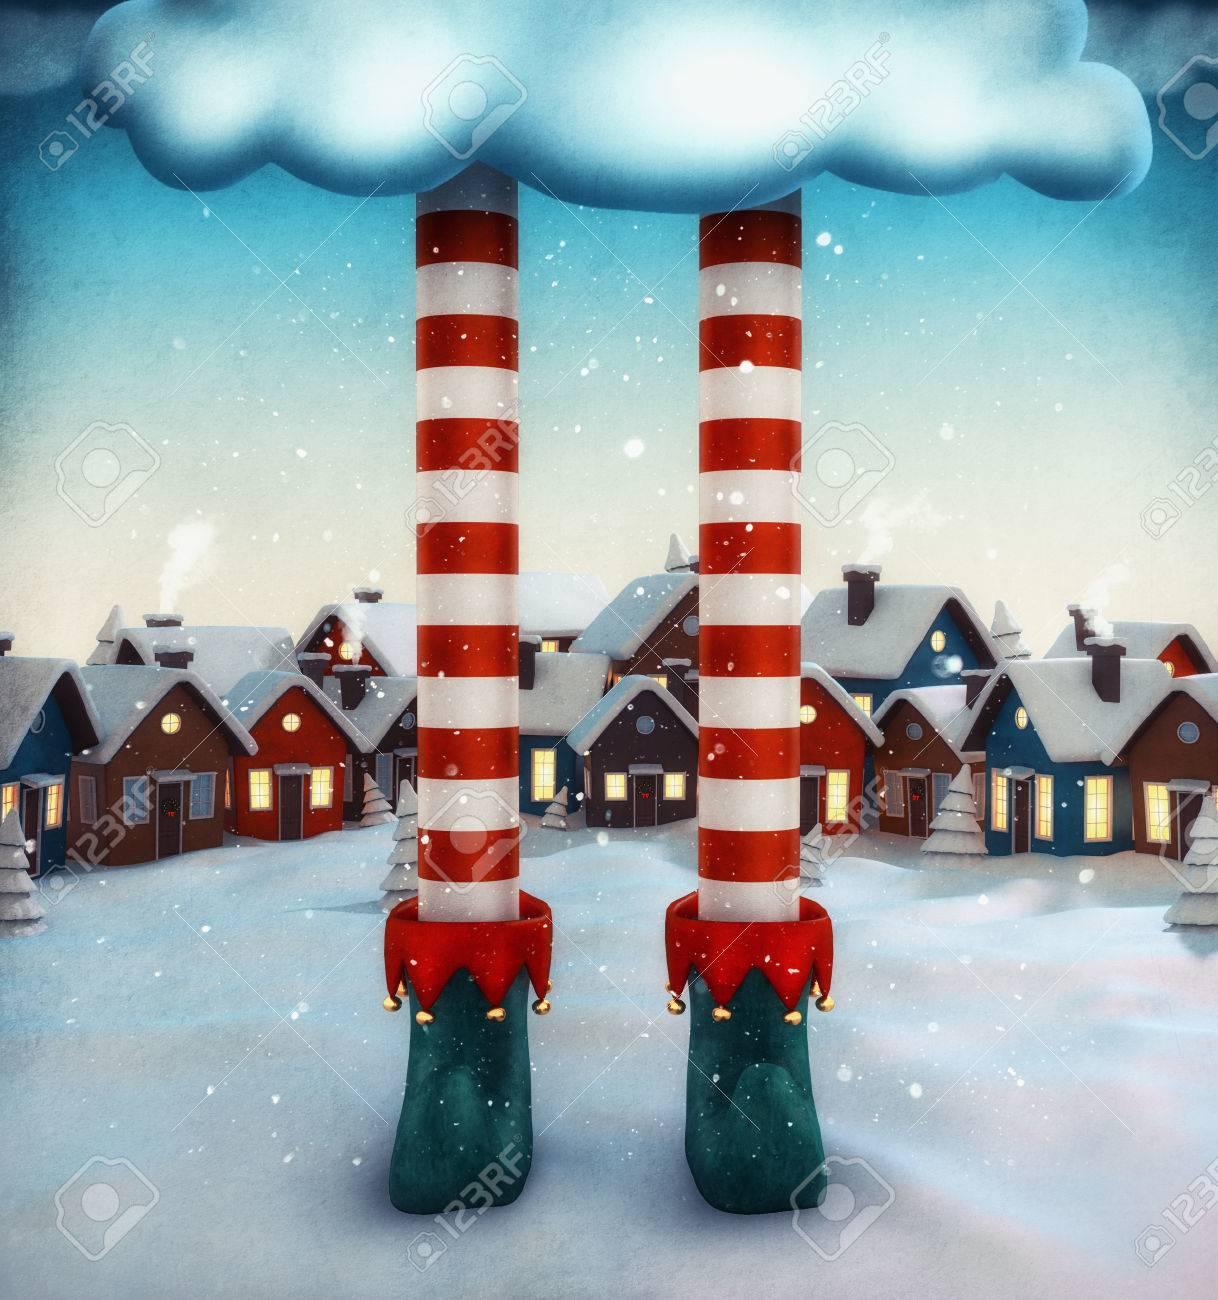 Amazing fairy illustration with elf and cartoon houses. Unusual christmas illustration. Stock Illustration - 46807289